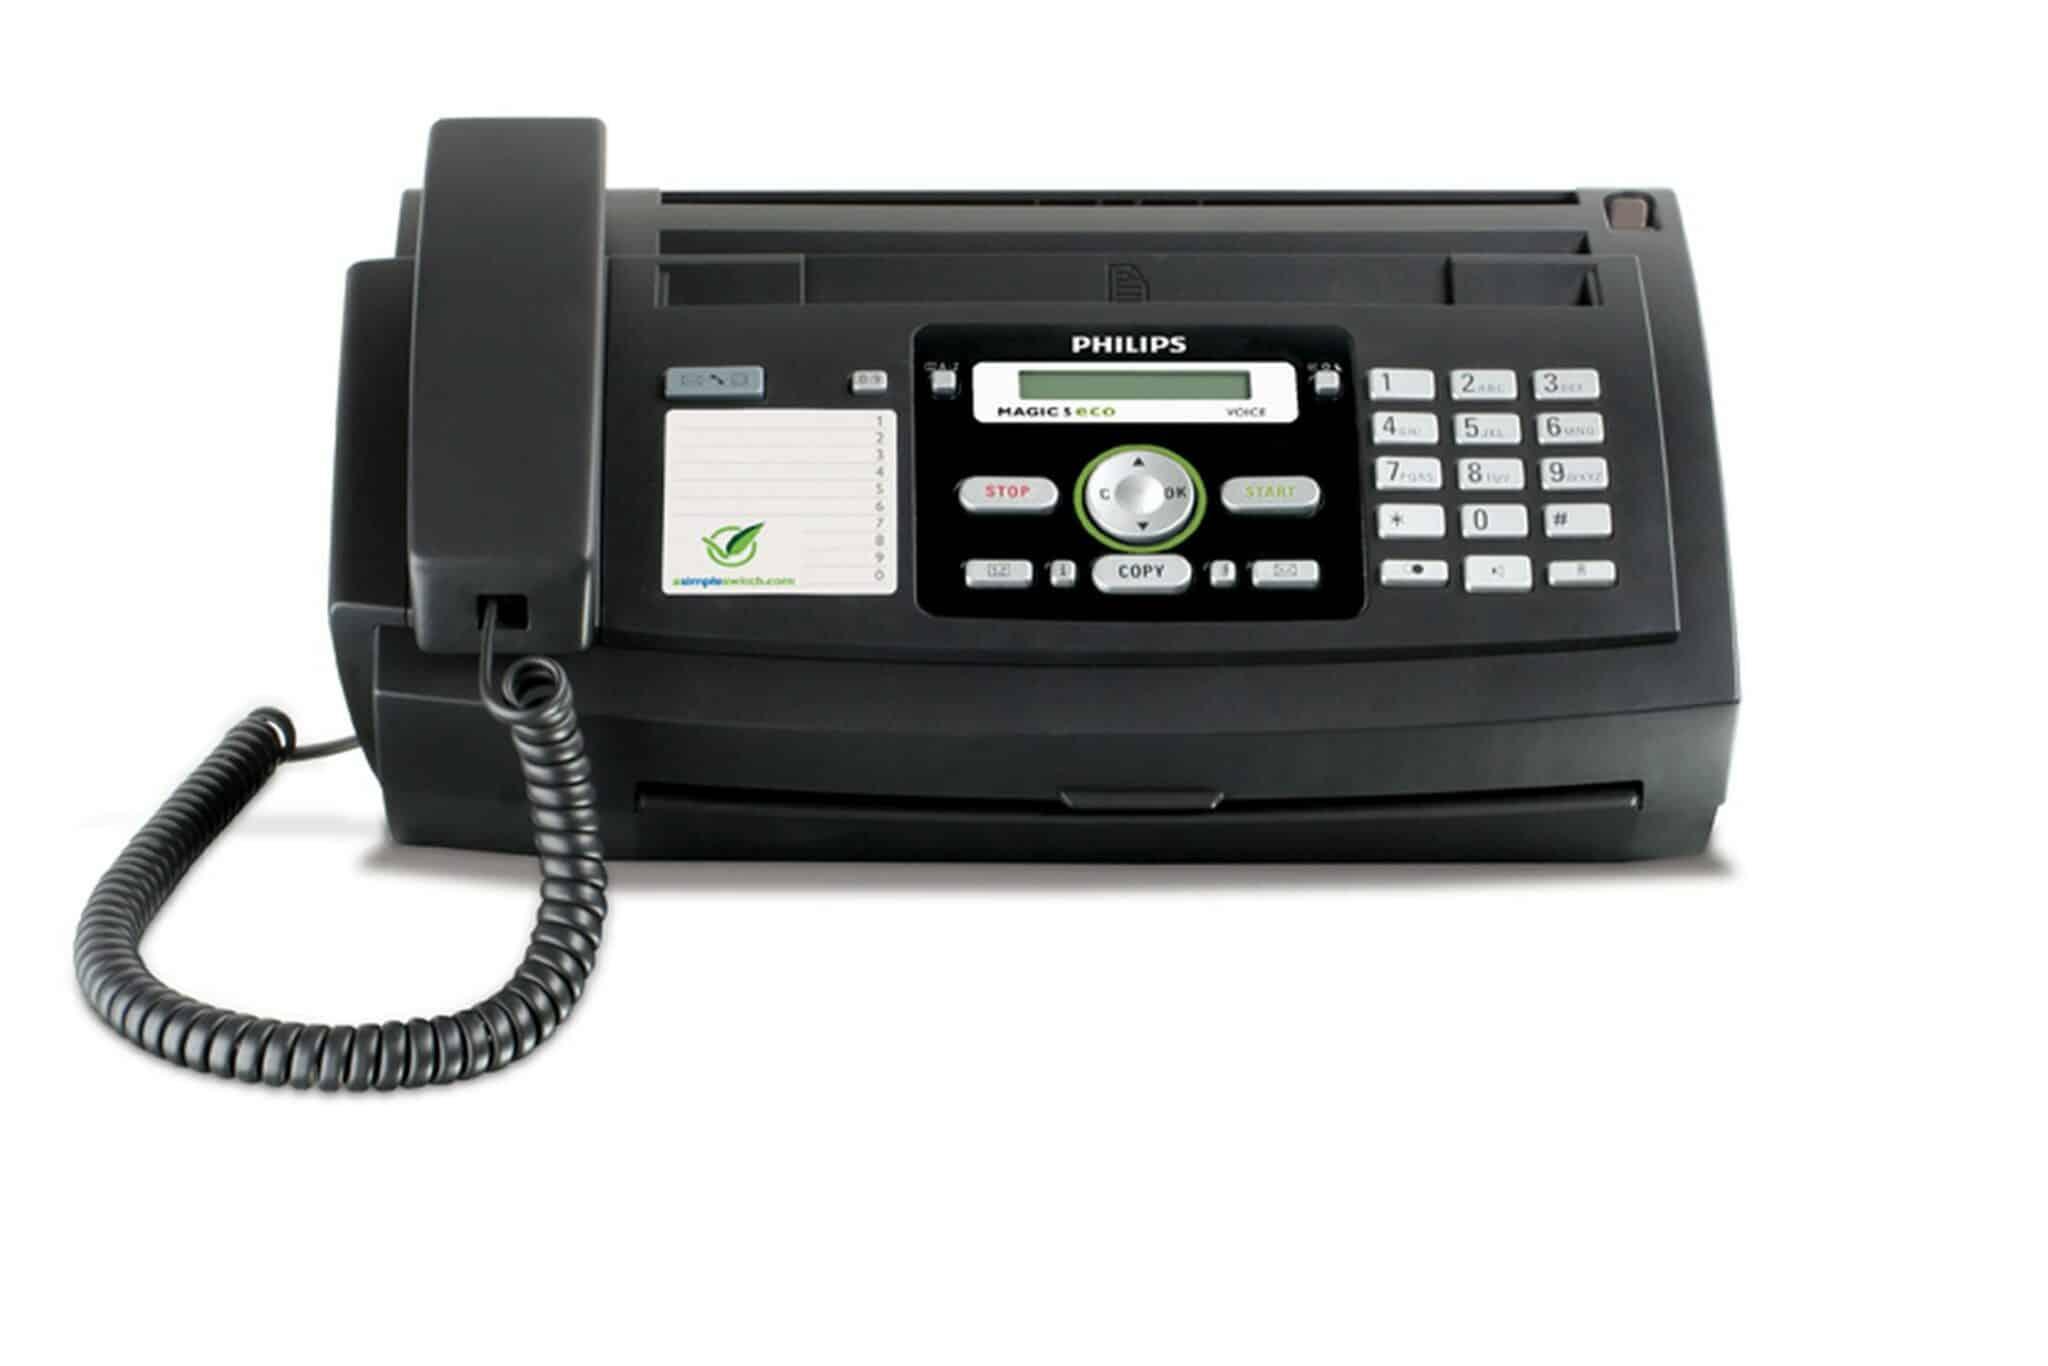 4 in 1 philips magic 5 eco voice primo fax ger t mit telefon und ab neu gastro. Black Bedroom Furniture Sets. Home Design Ideas